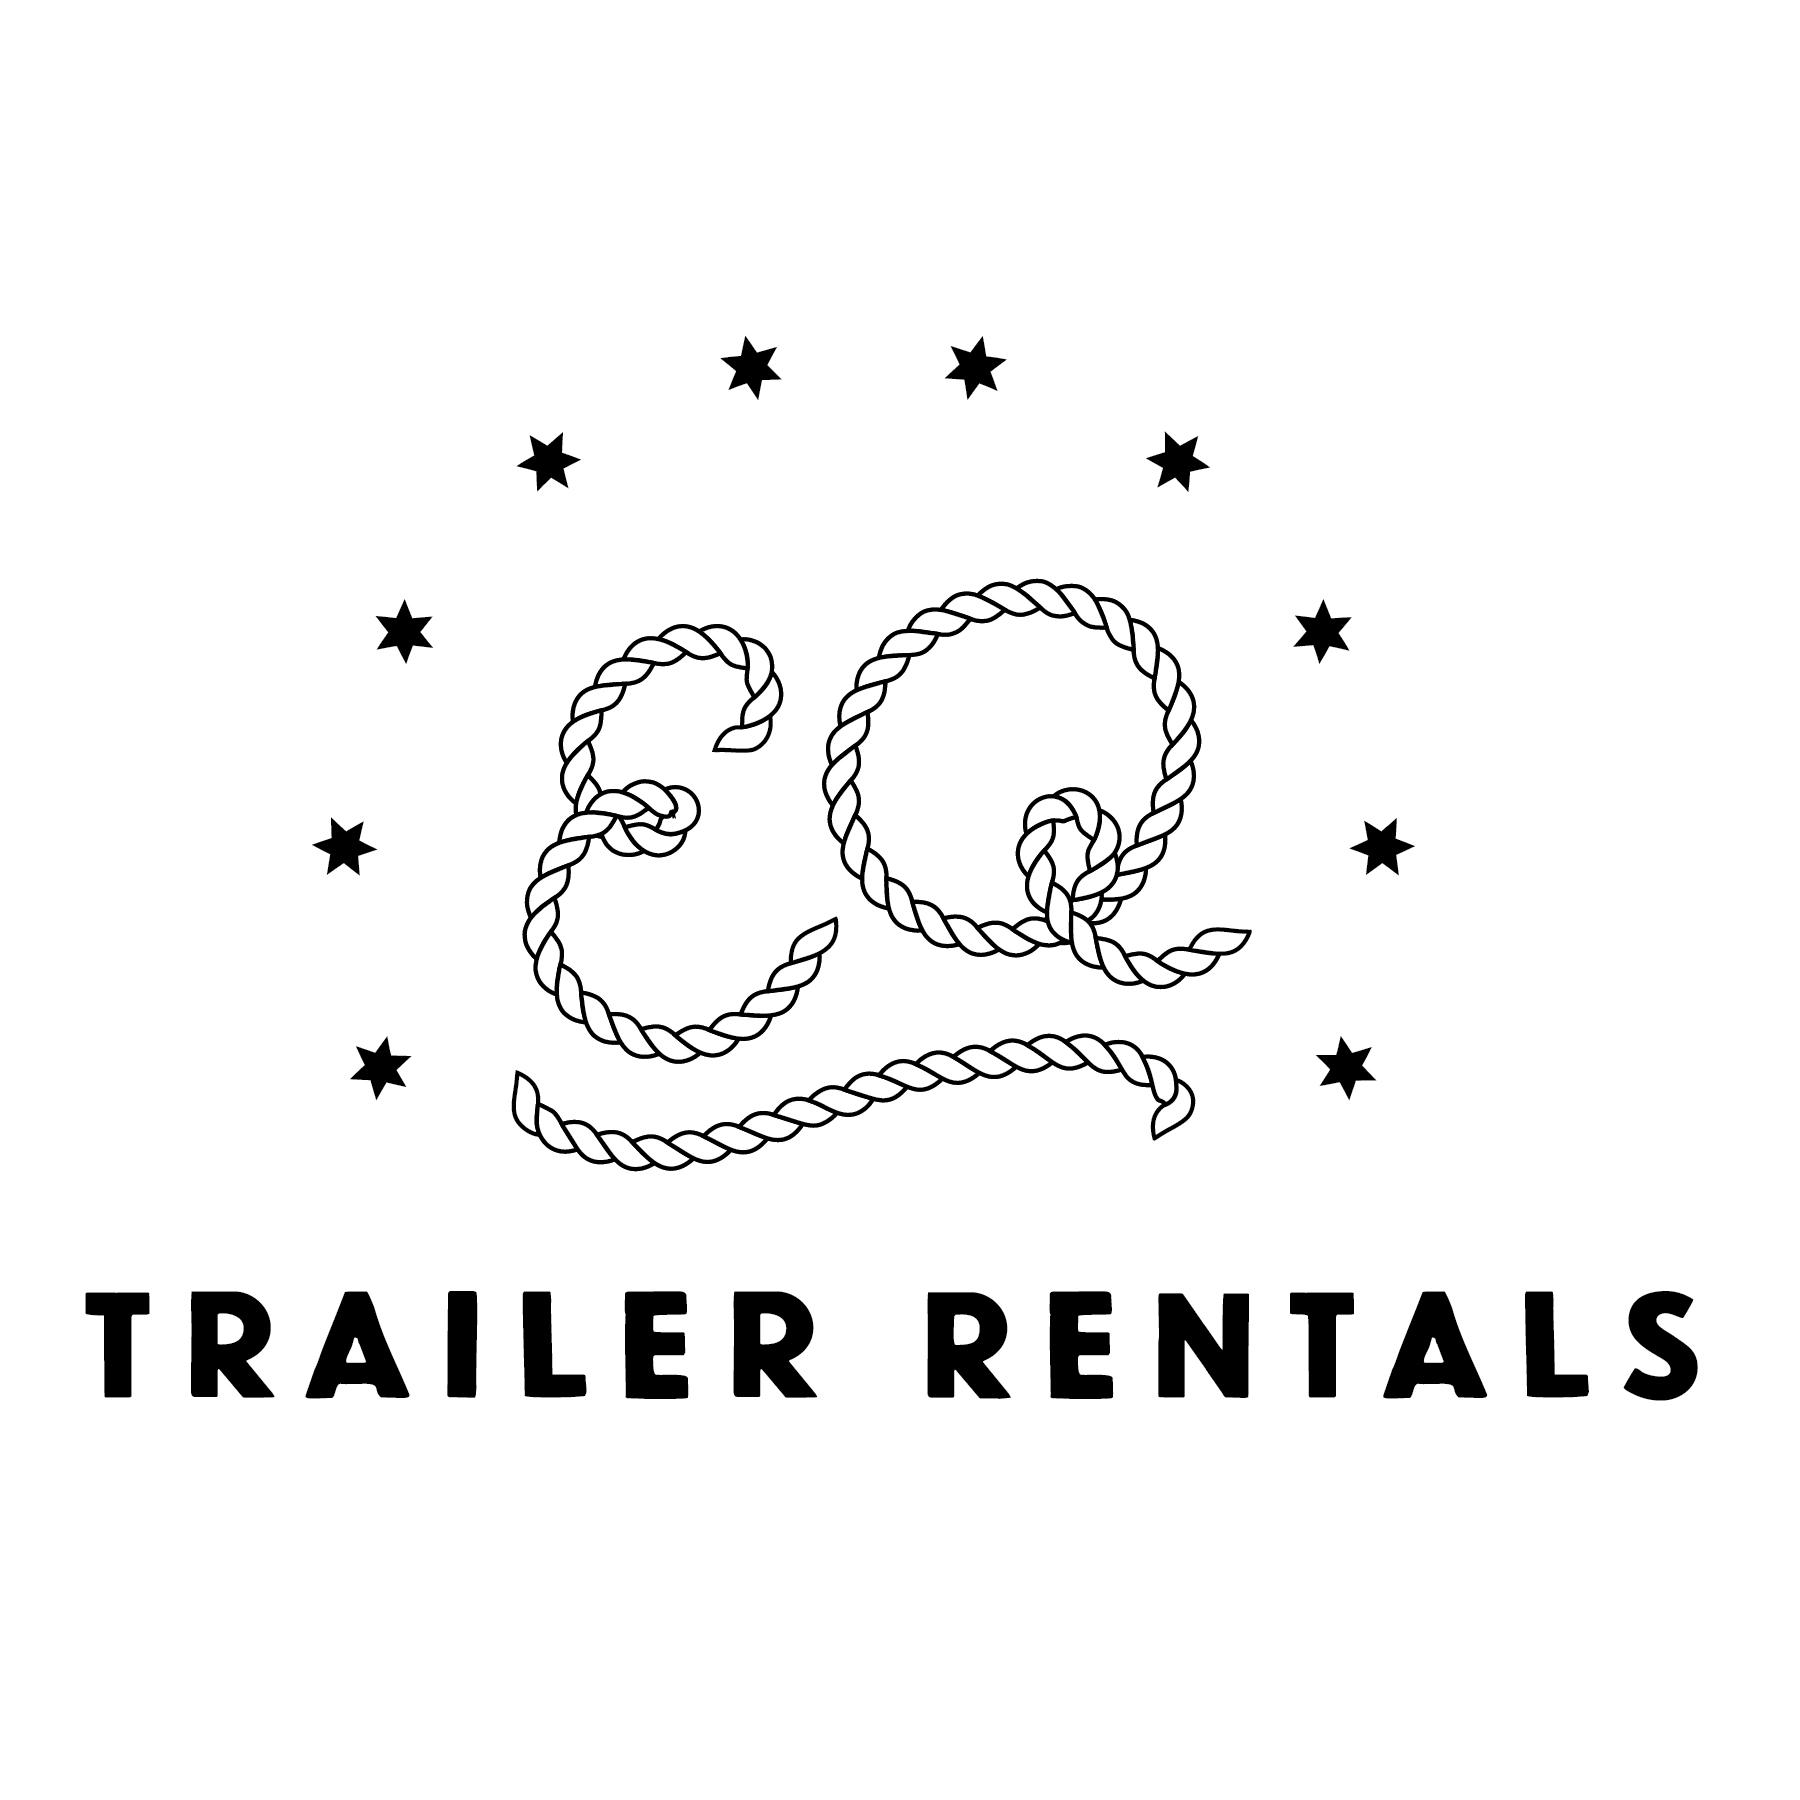 eqtrailerrentals_tshirt_logo.jpg